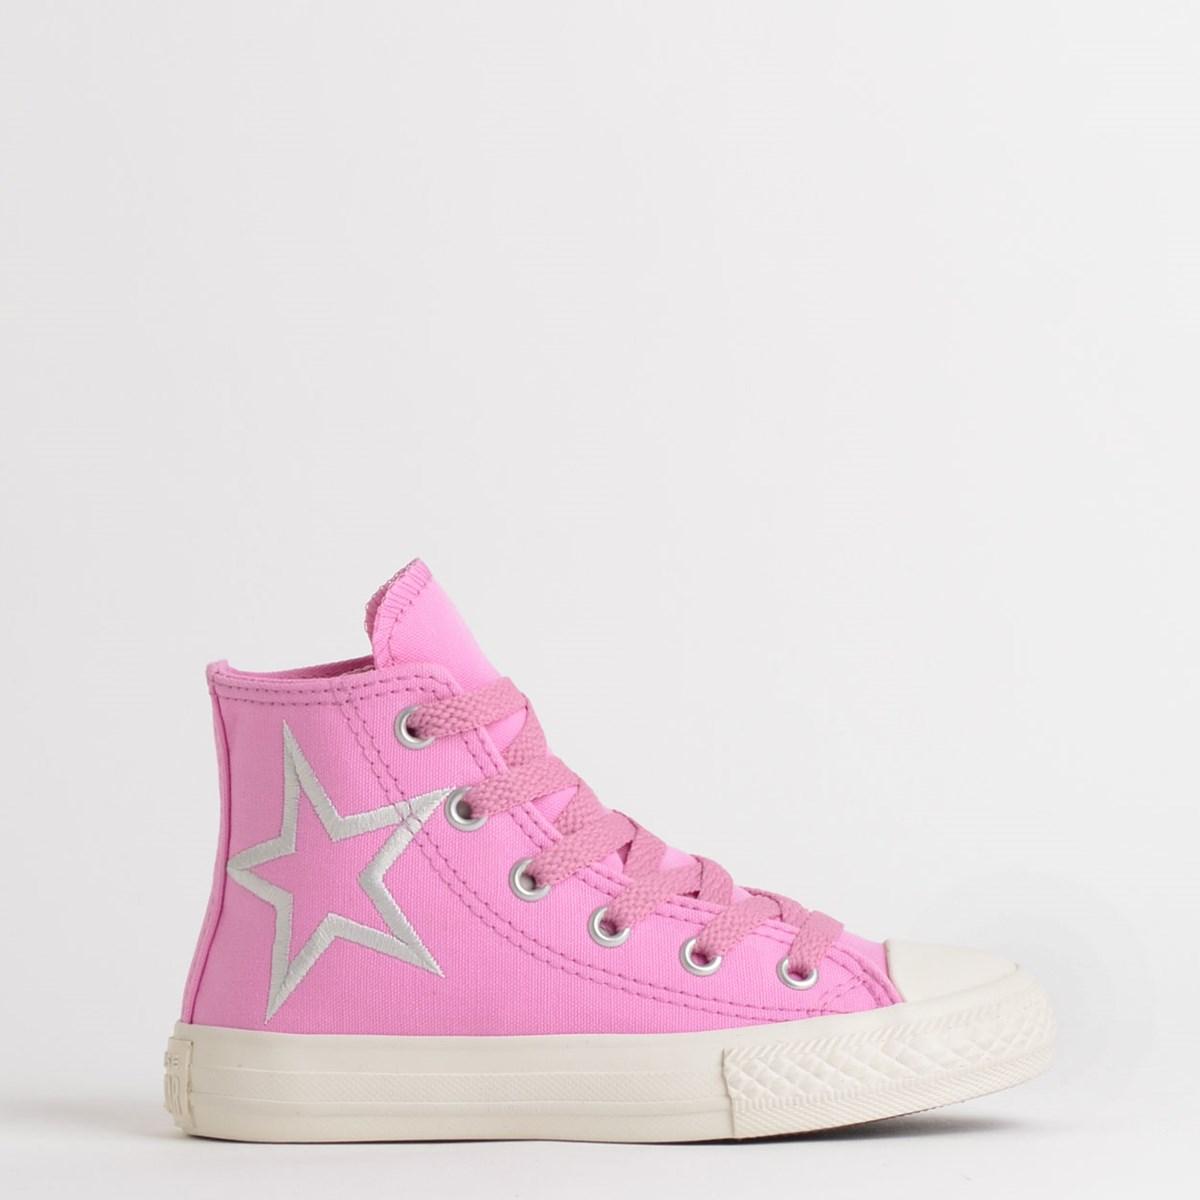 Tênis Converse Chuck Taylor All Star Kids Hi Rosa Claro Prata Puro CK08160001